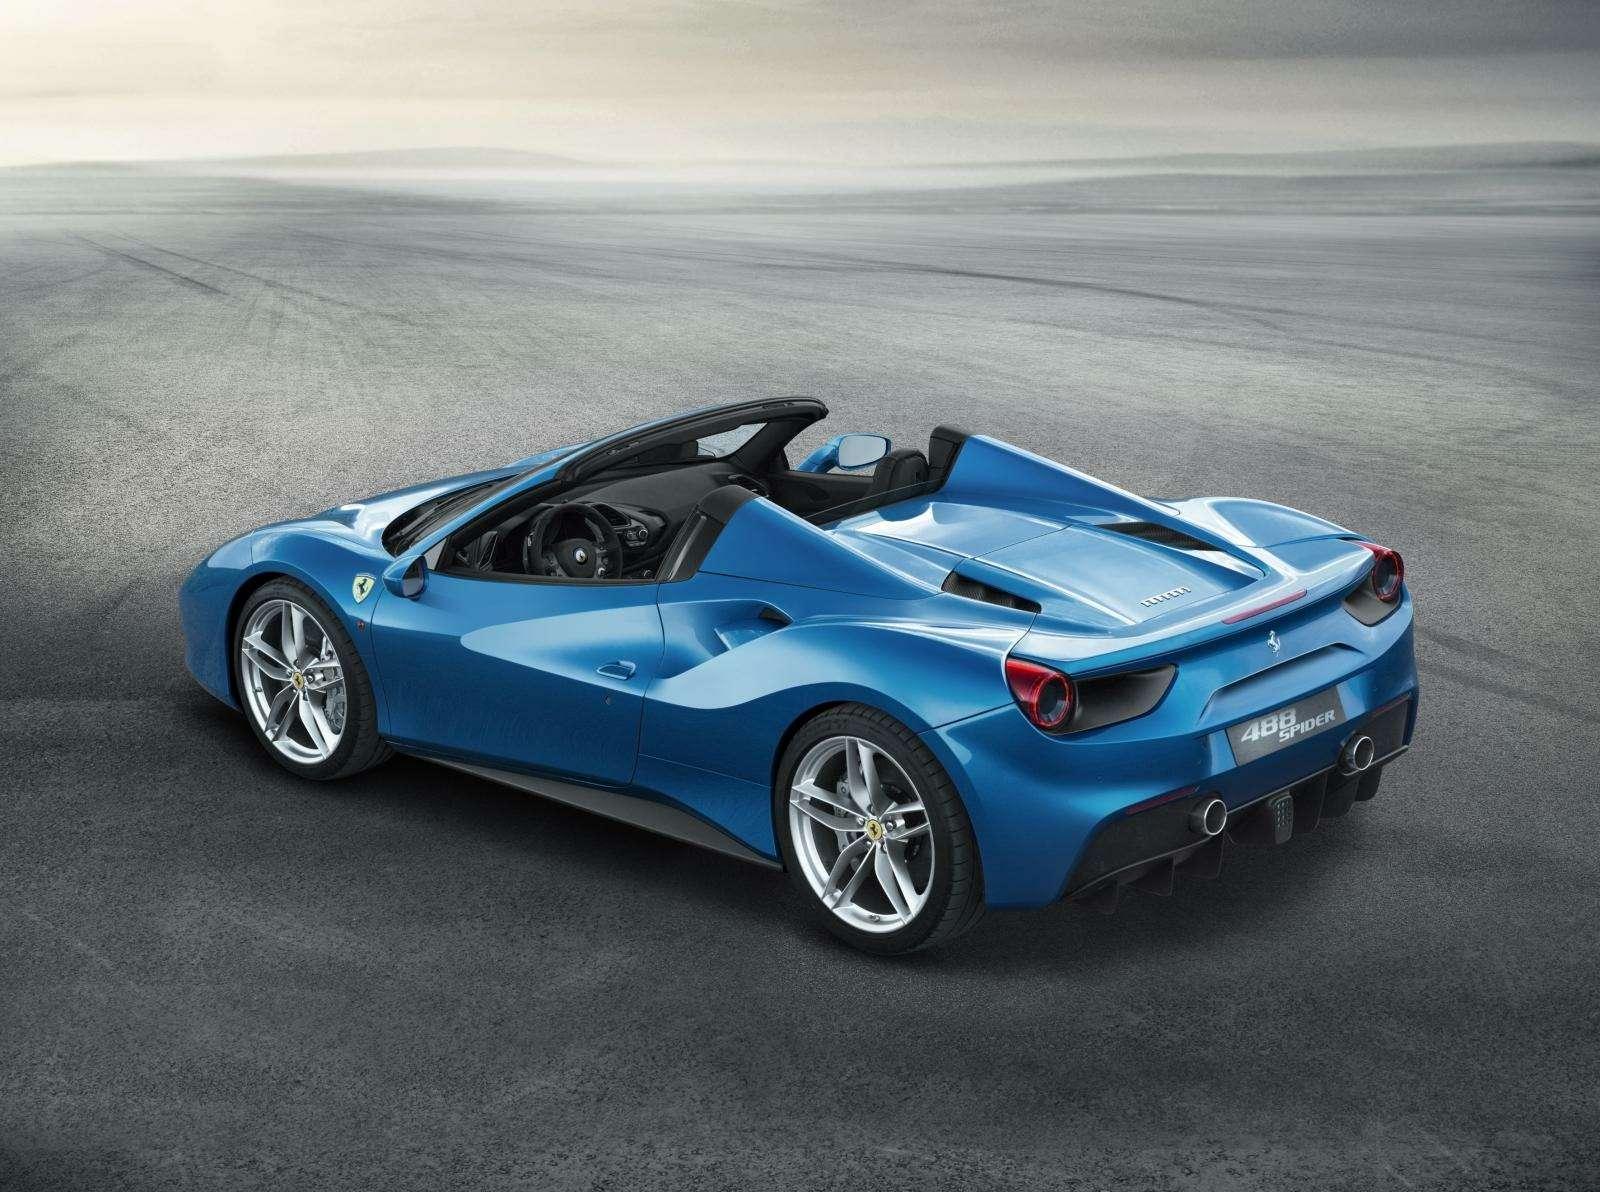 FerrariS6